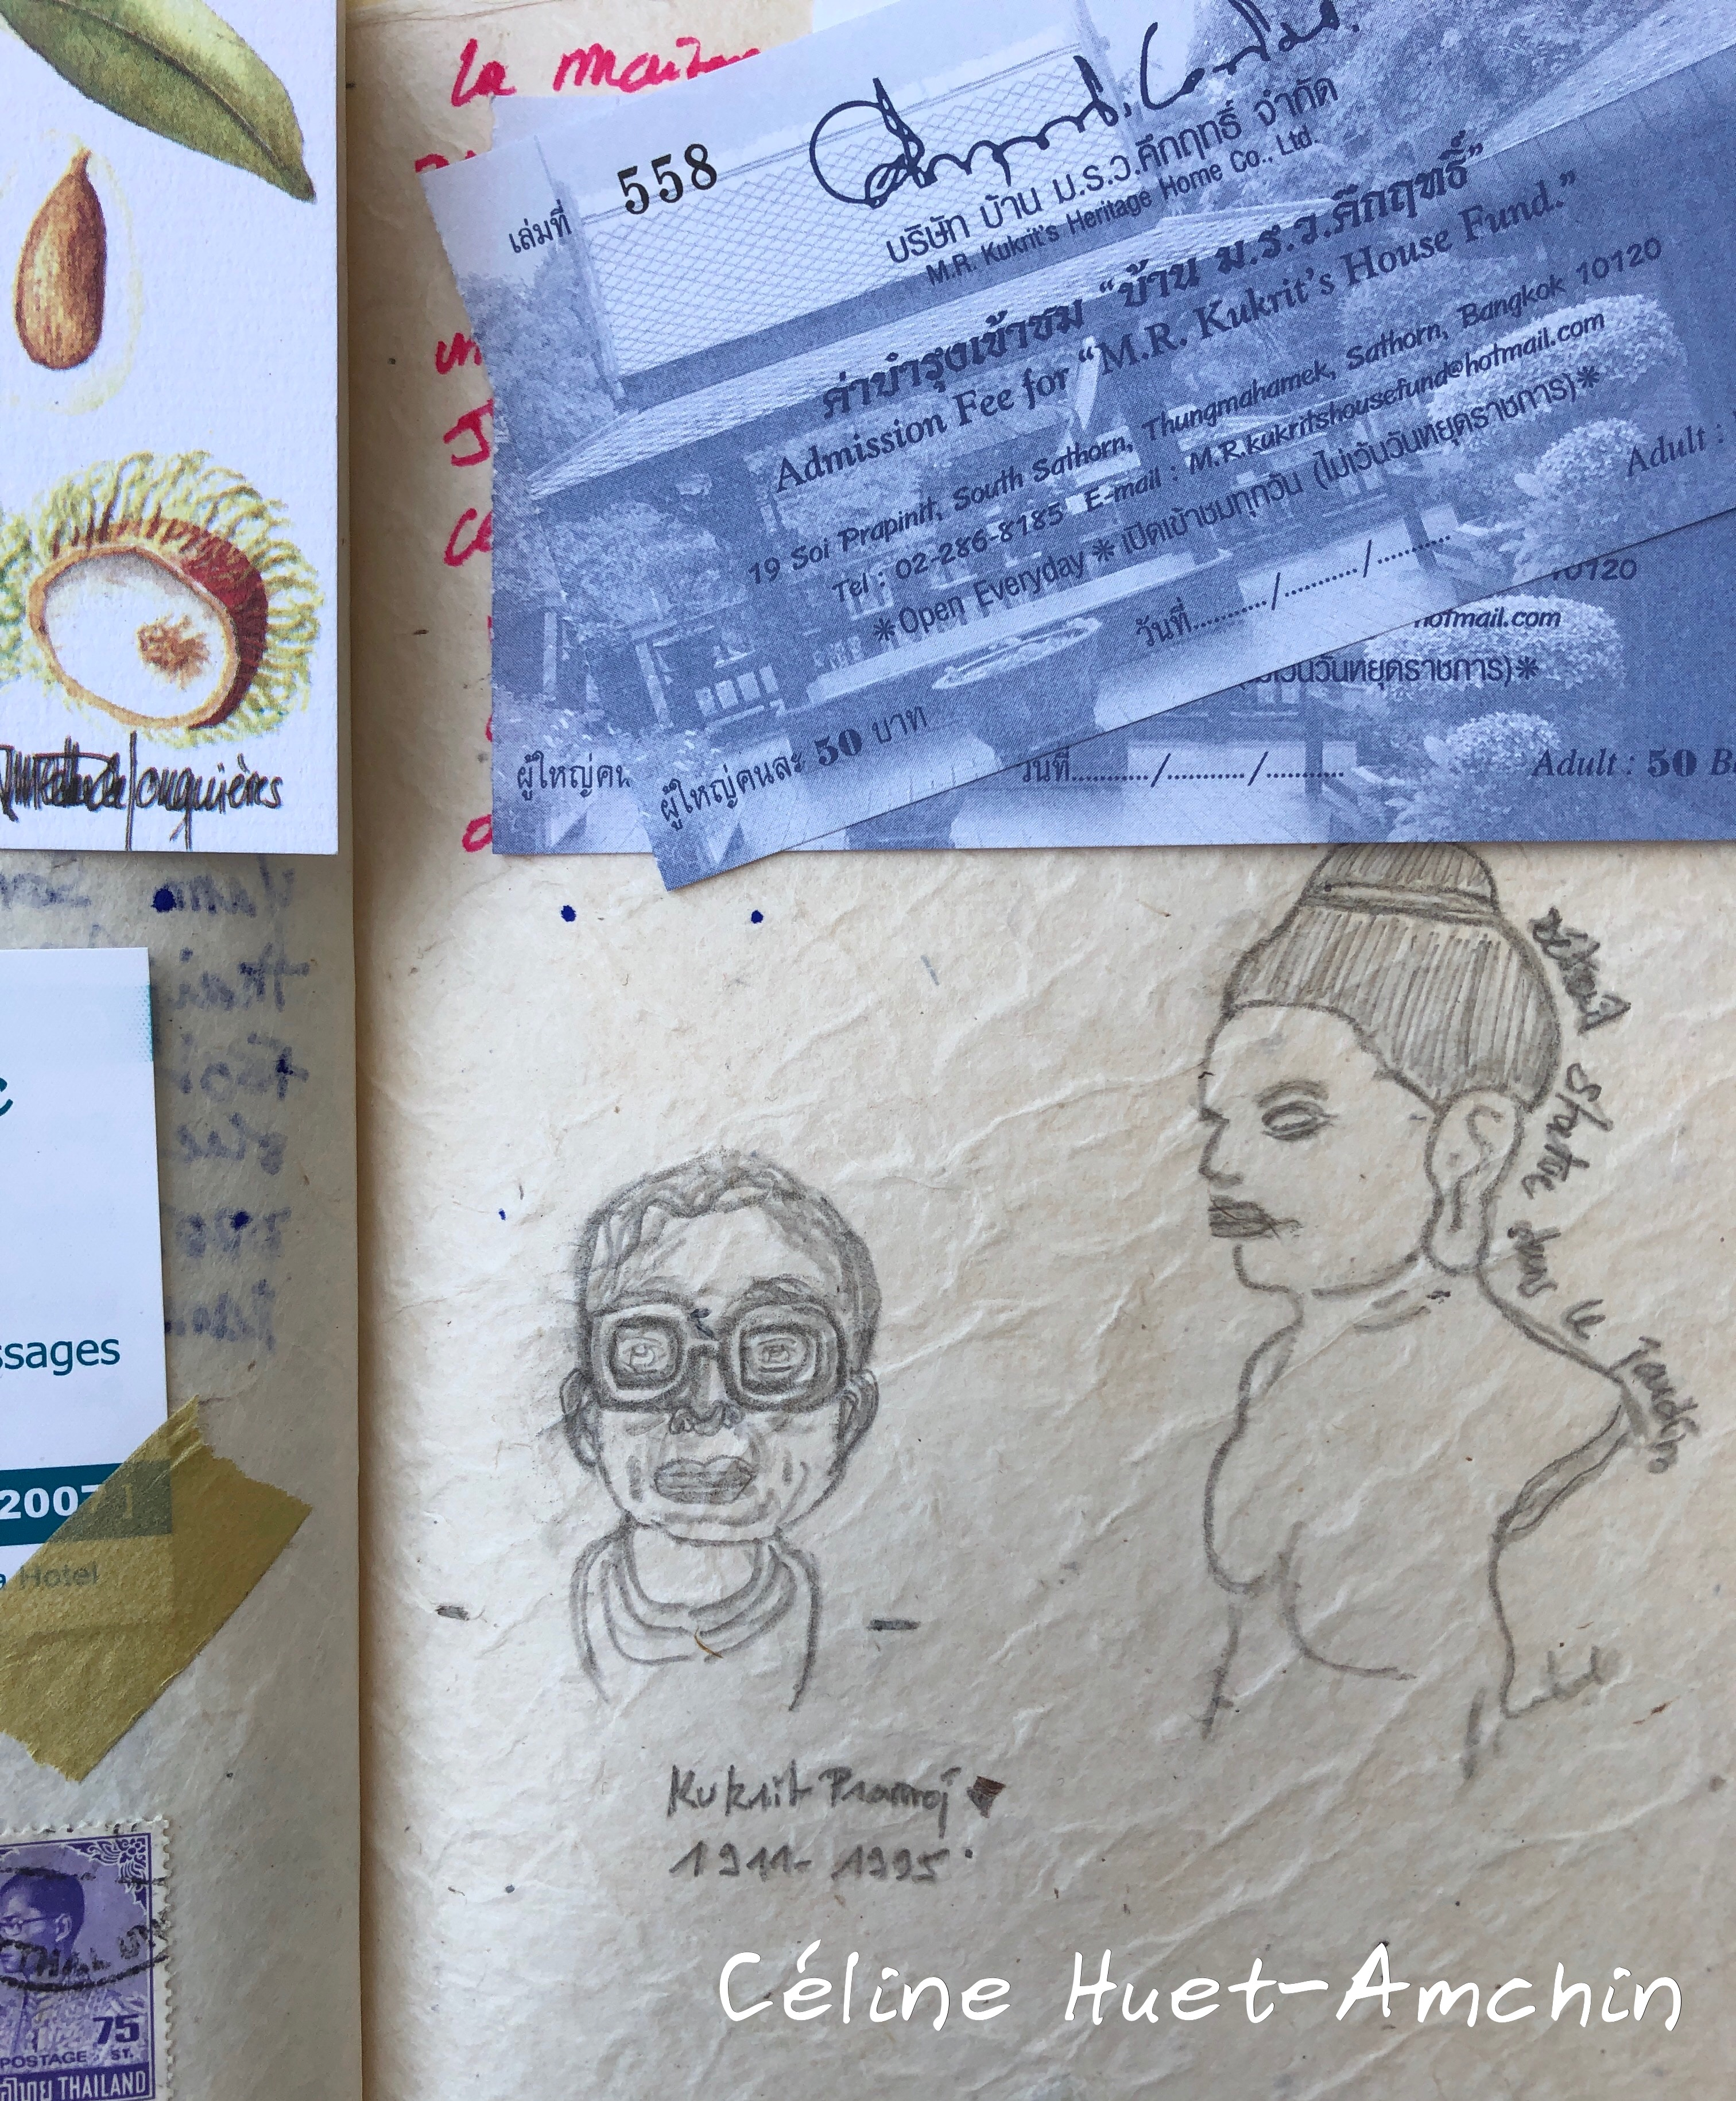 Carnet de voyage Instantanés d'Asie II Bangkok Thaïlande Asie Céline Huet-Amchin